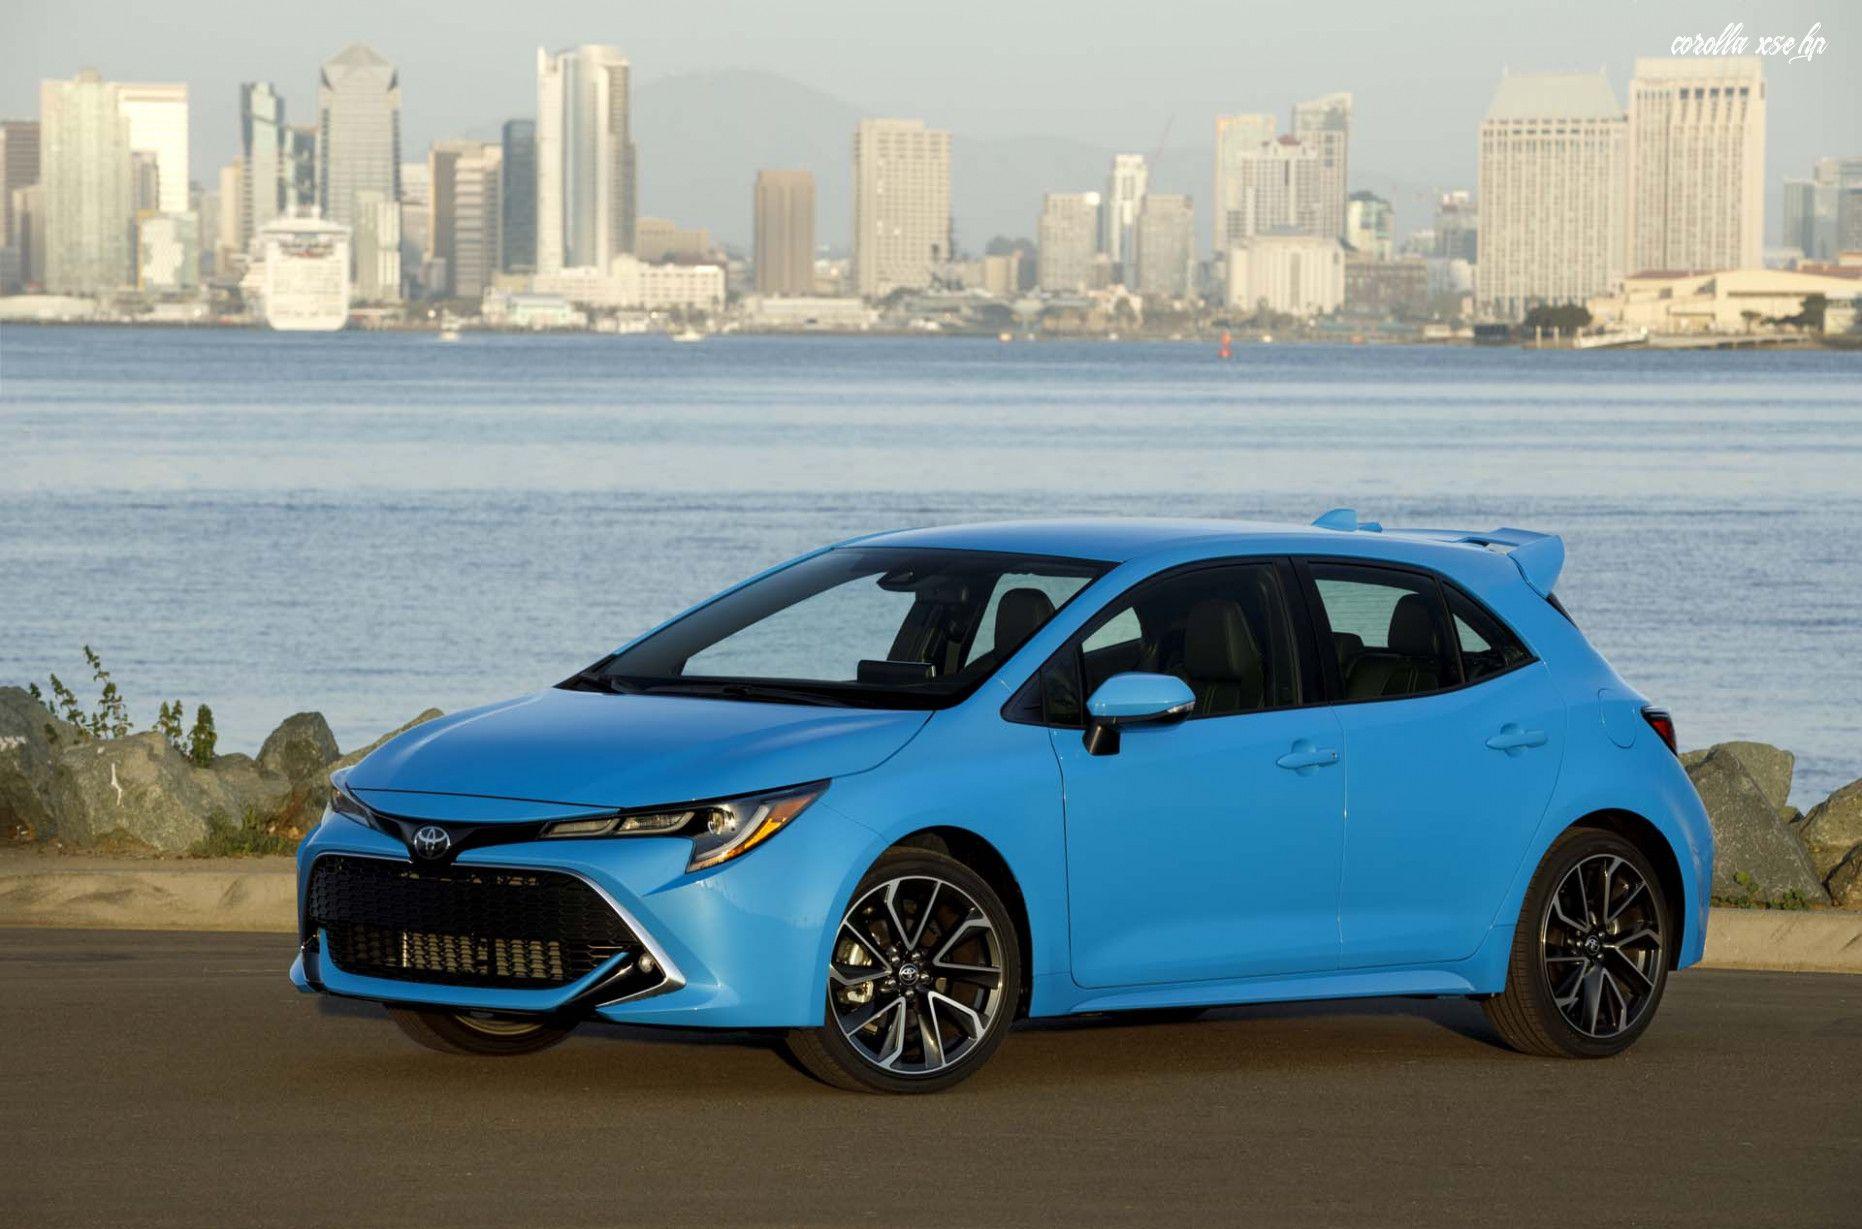 Corolla Xse Hp New Concept In 2020 Toyota Corolla Toyota Cars Toyota